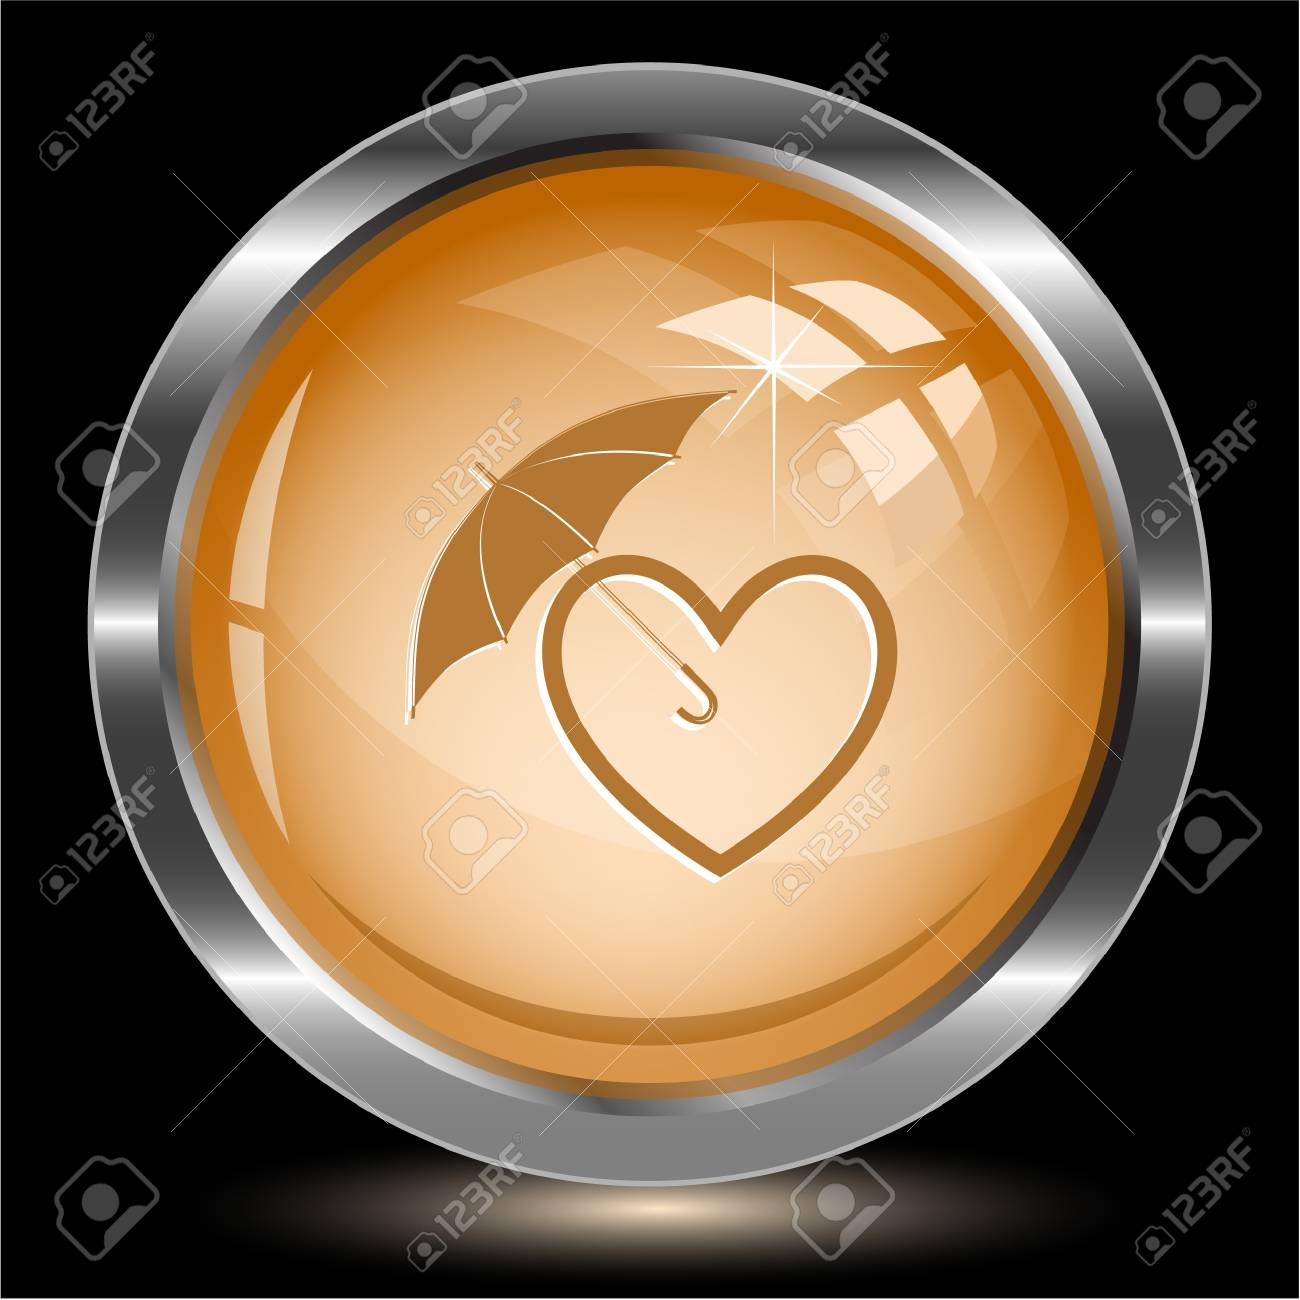 Protection love. Internet button. Vector illustration. Stock Illustration - 17194404